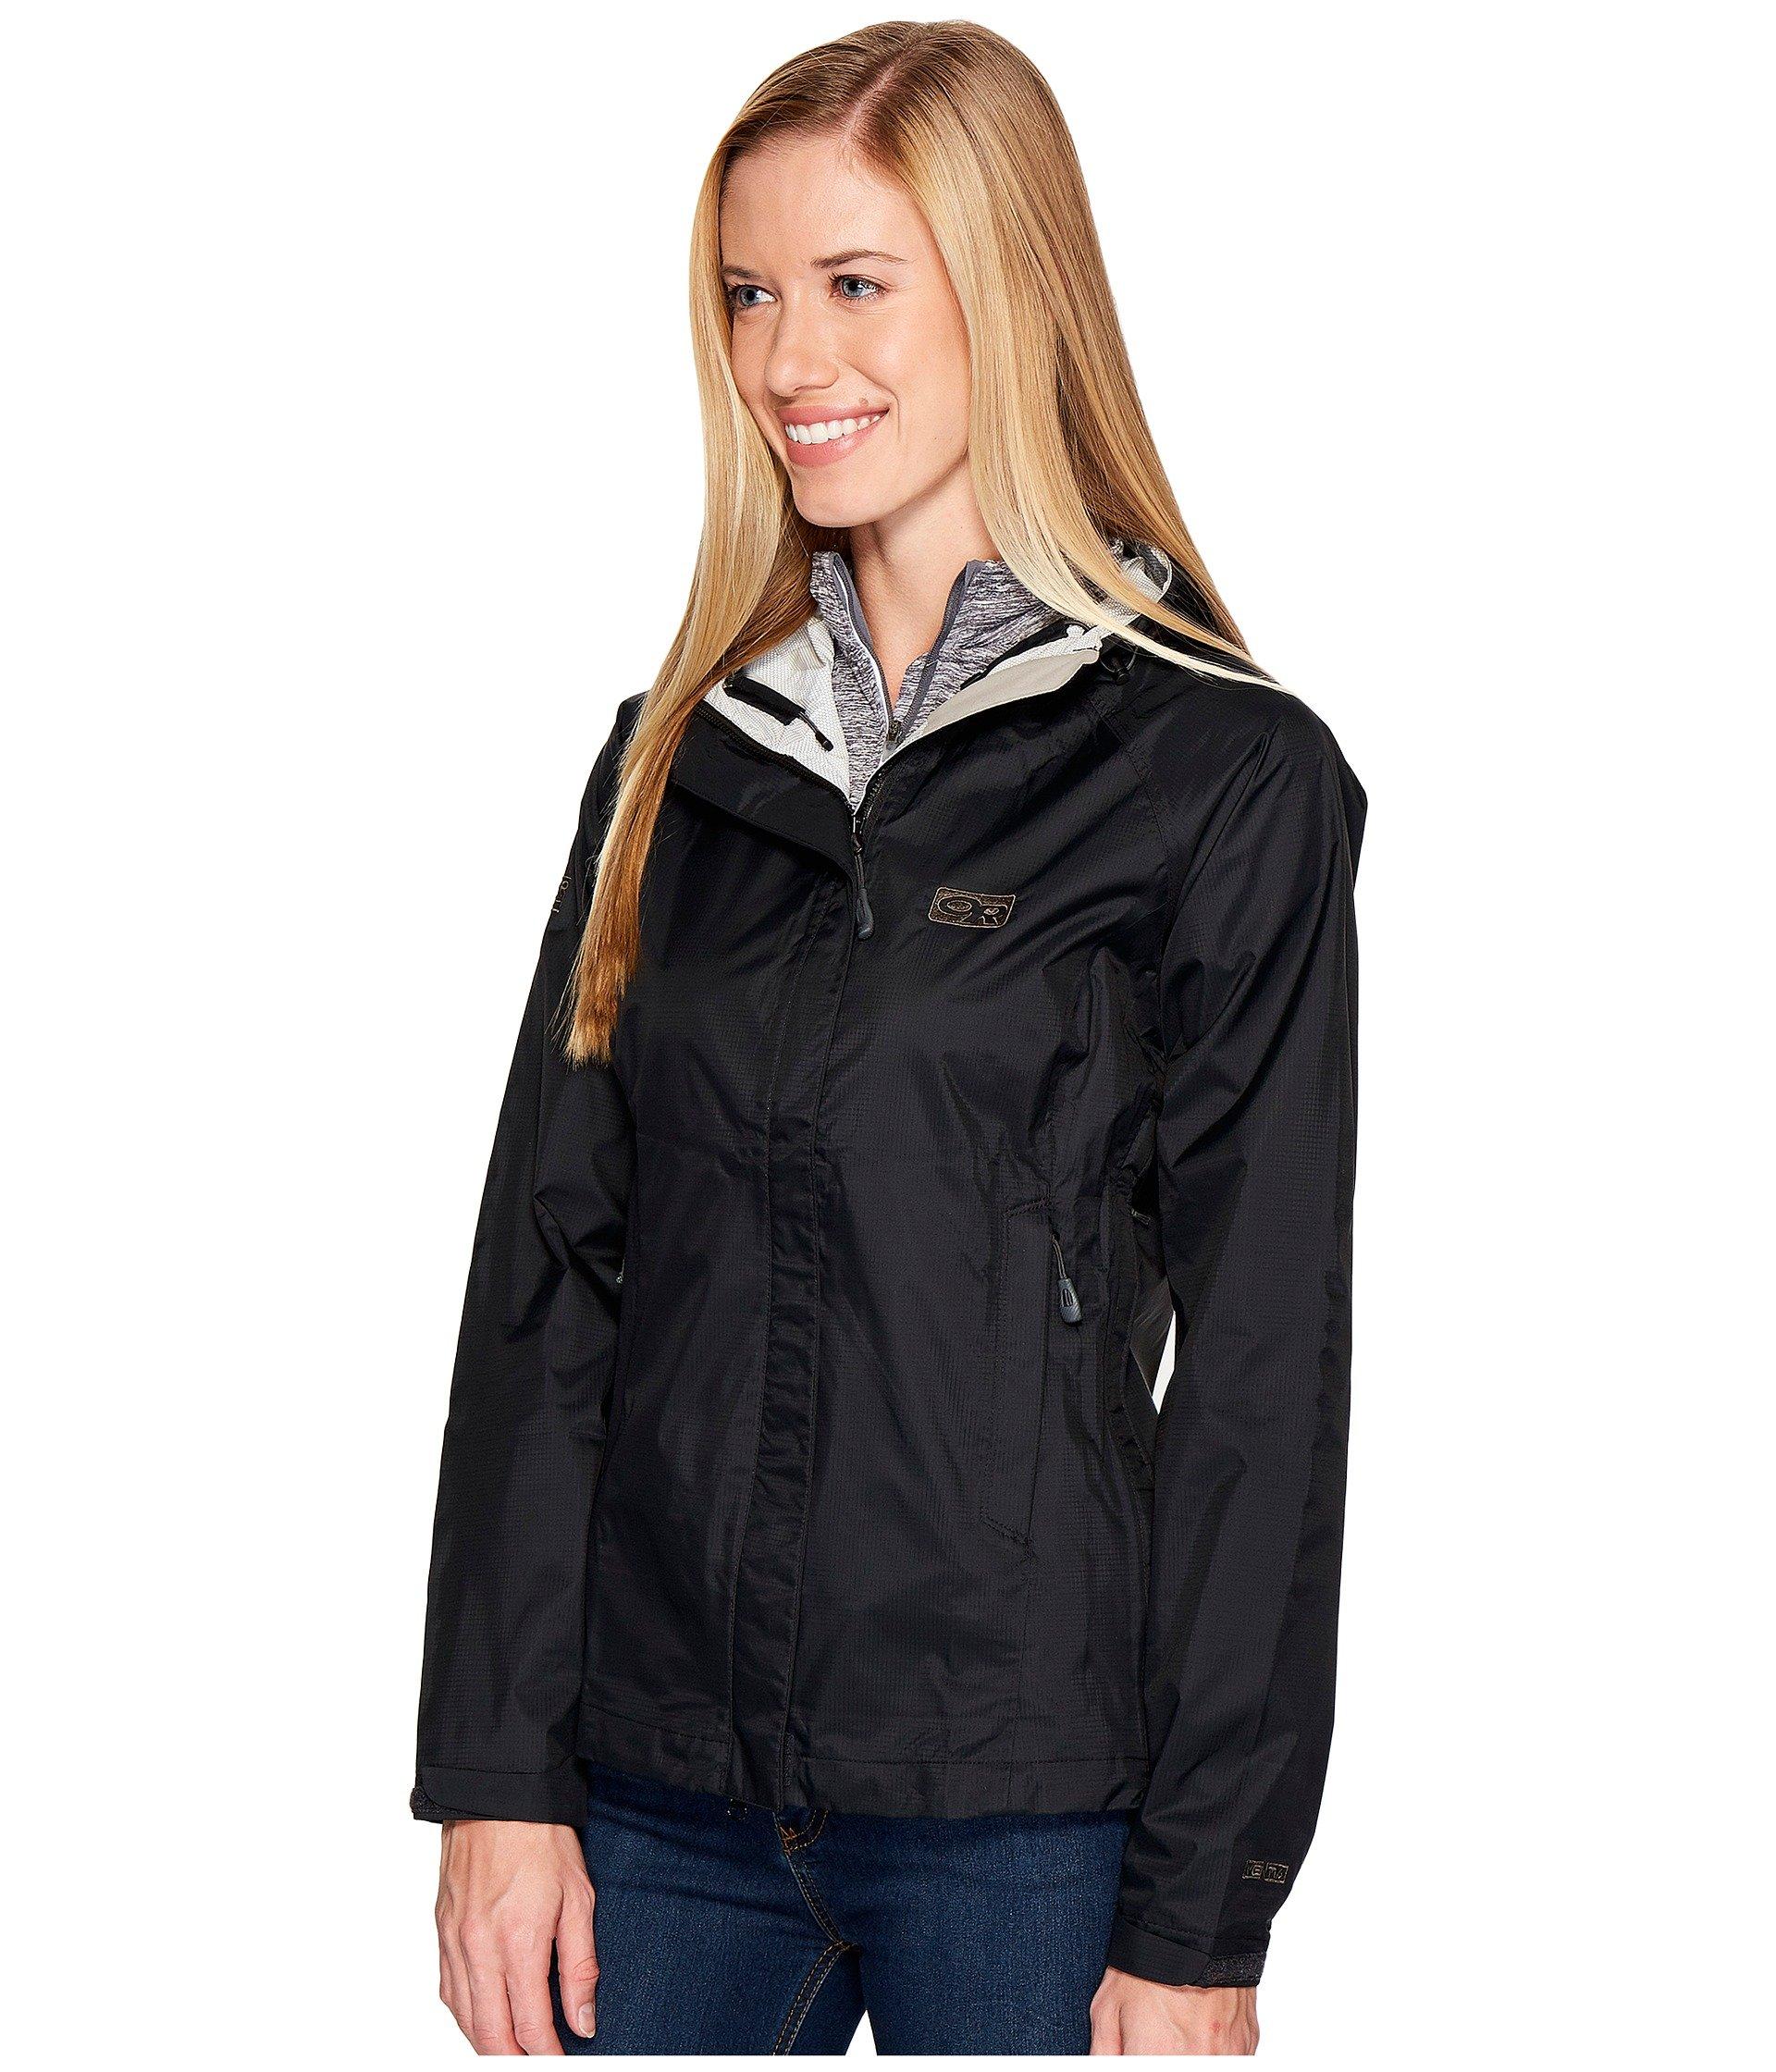 Jacket™ Horizon Outdoor Jacket™ Black Outdoor Research Outdoor Research Outdoor Horizon Research Black Horizon Black Jacket™ RZnAgZq